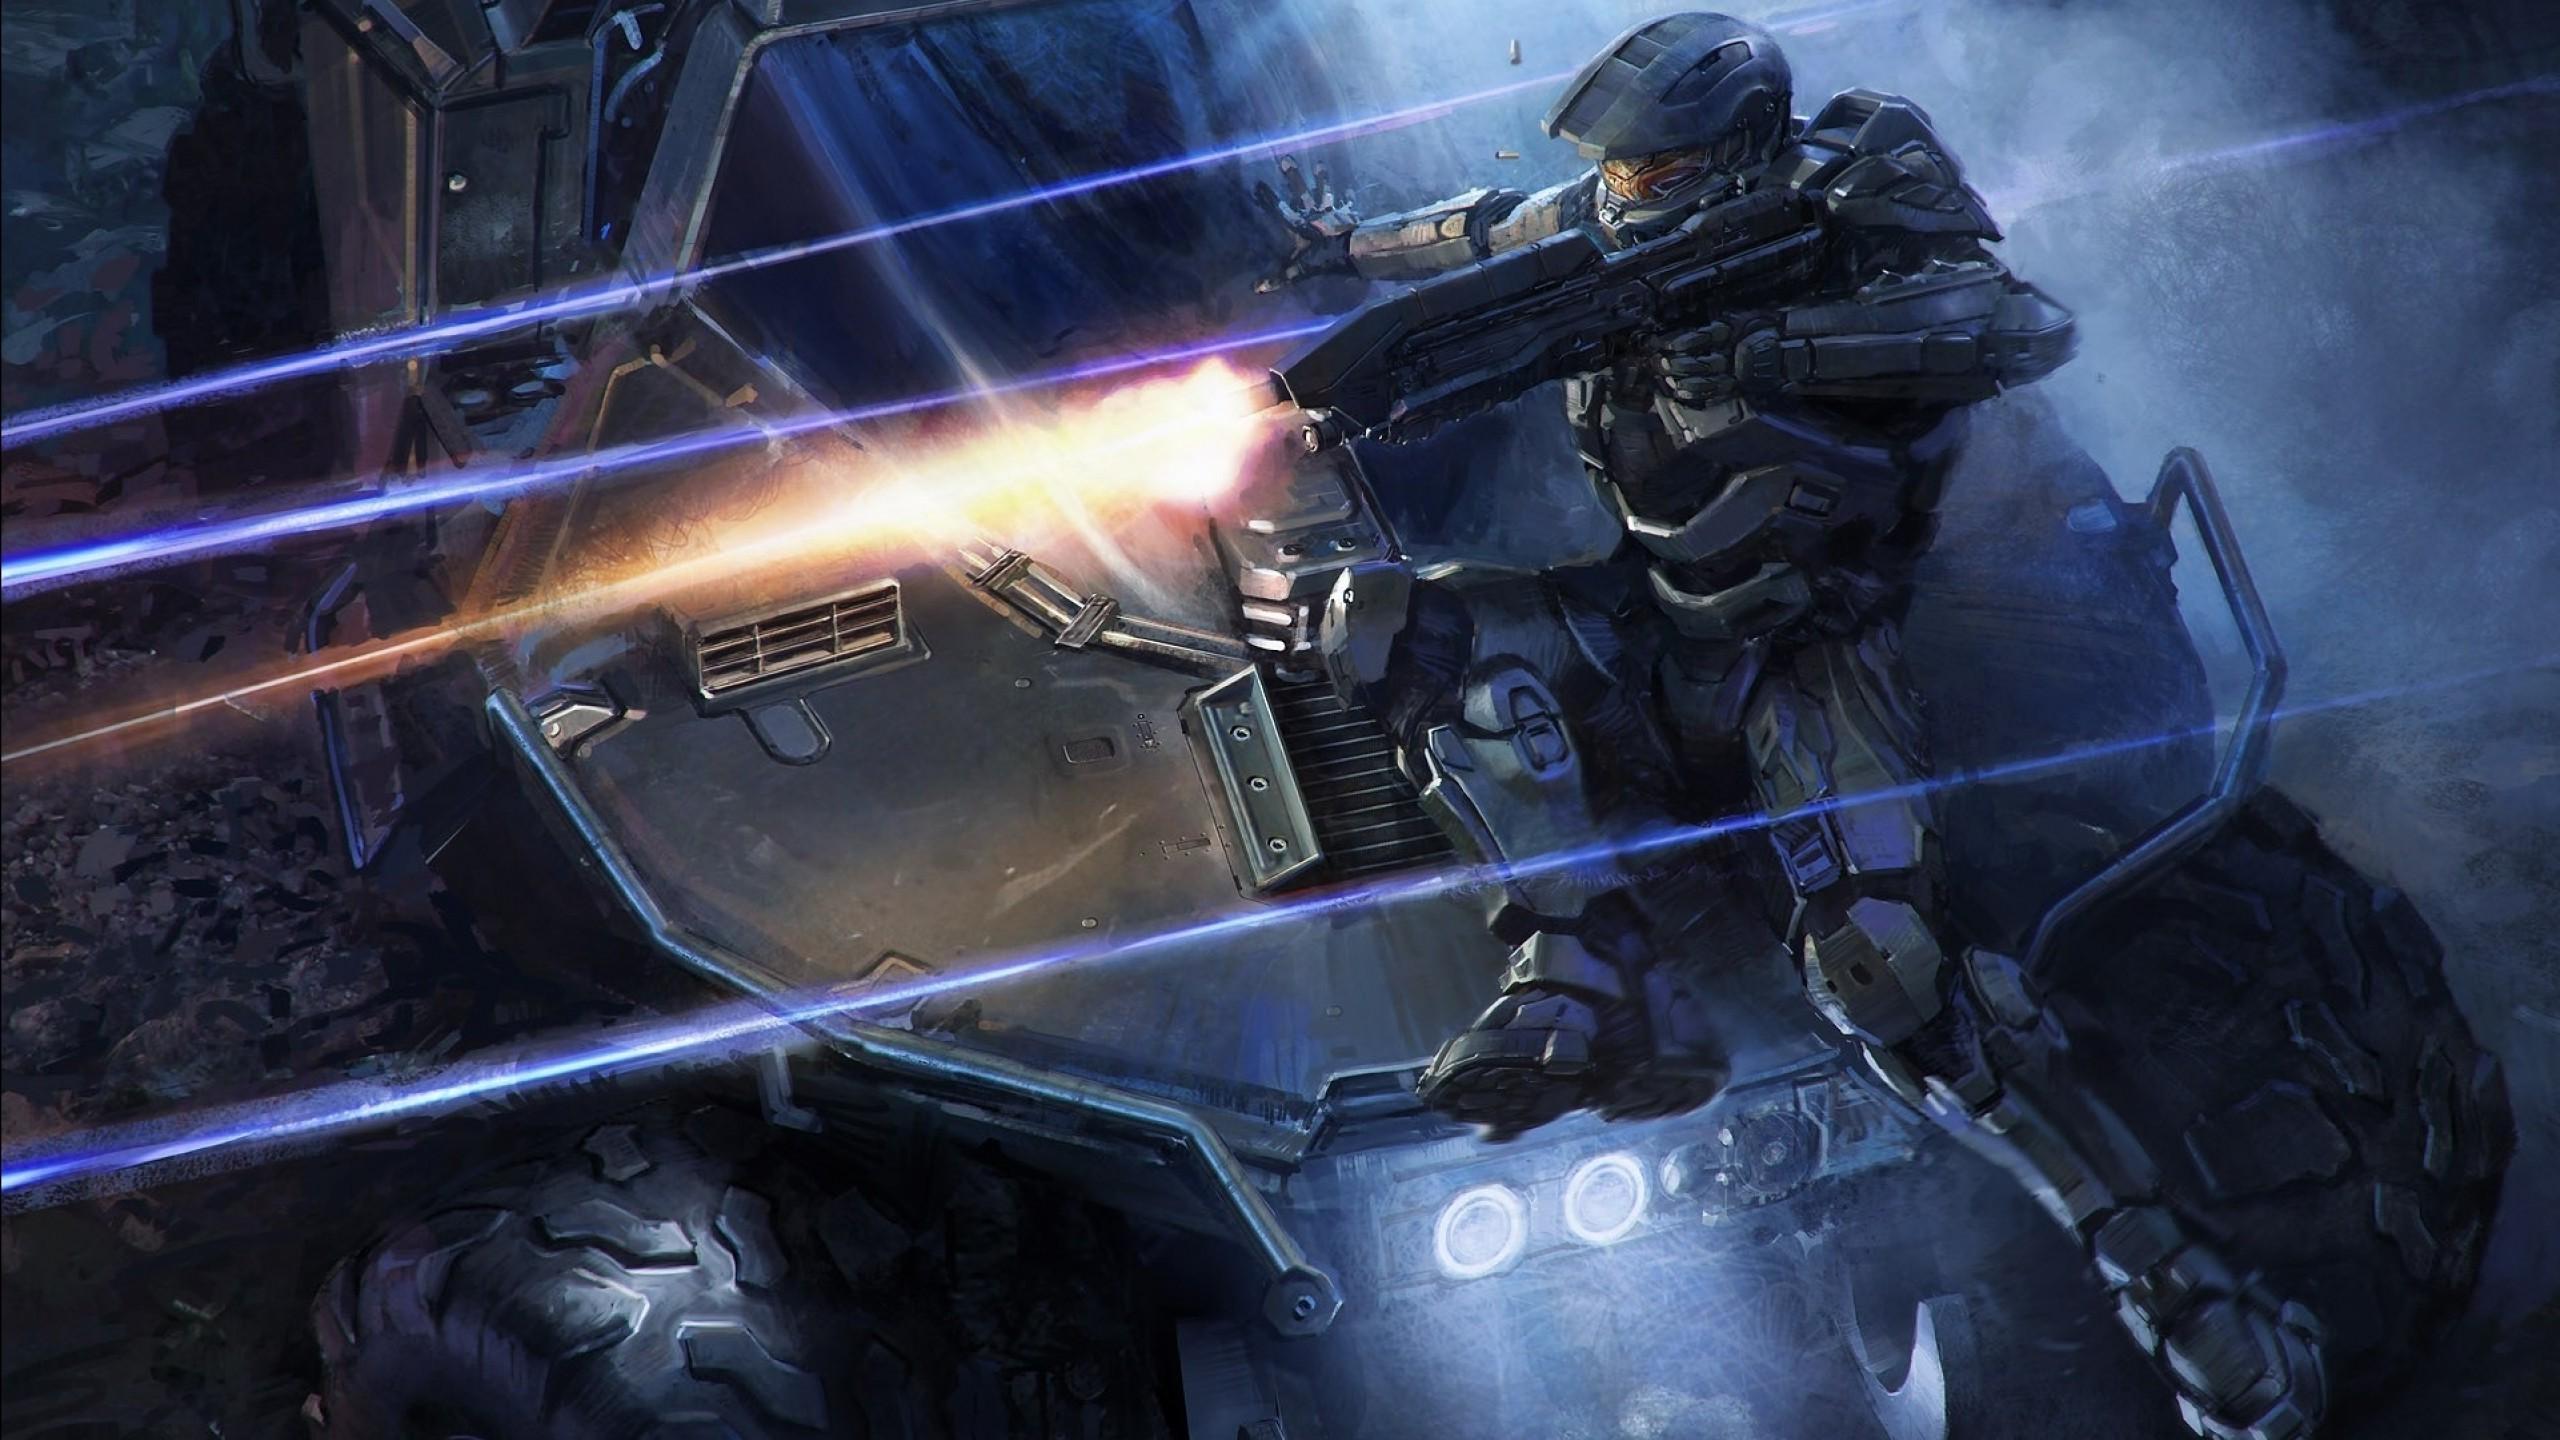 Wallpaper Digital Art Video Games Master Chief Xbox One